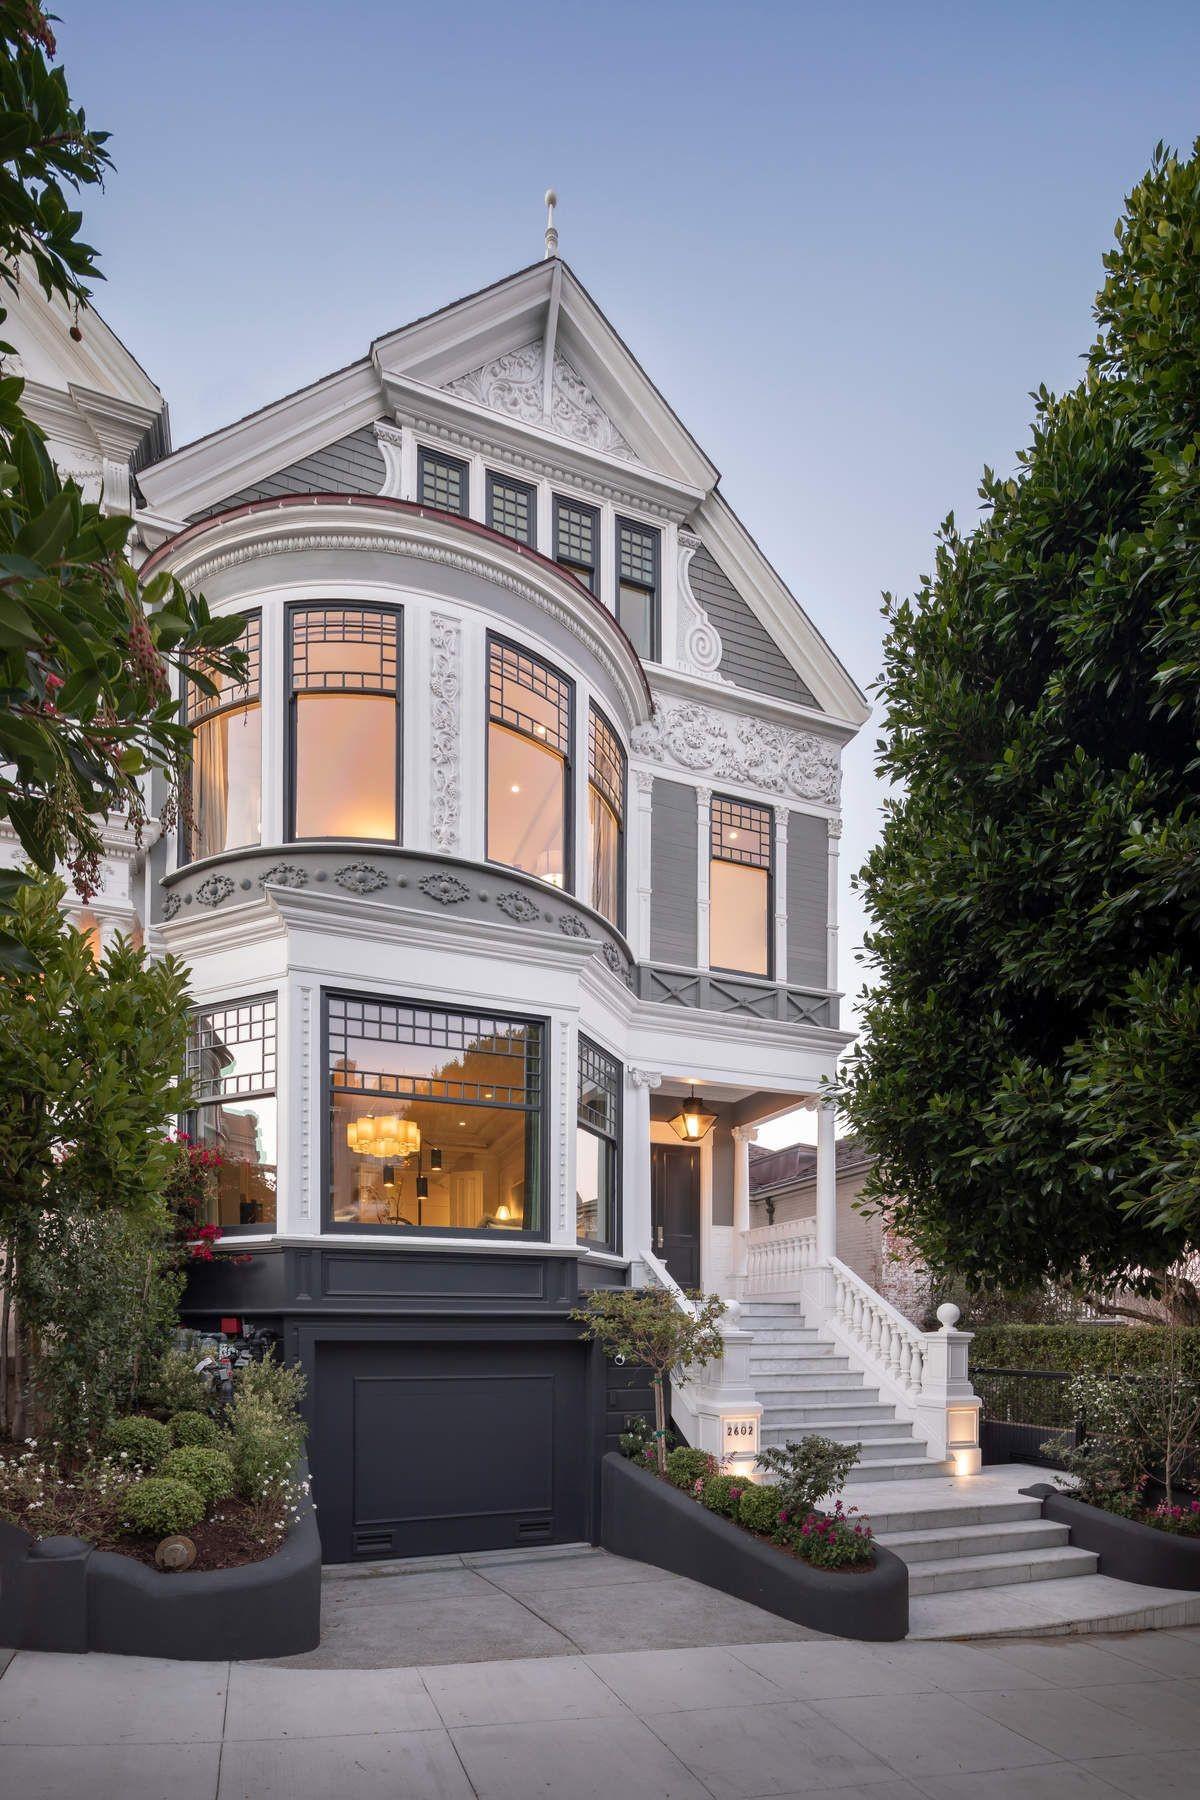 Meg Ryan's house in San Francisco